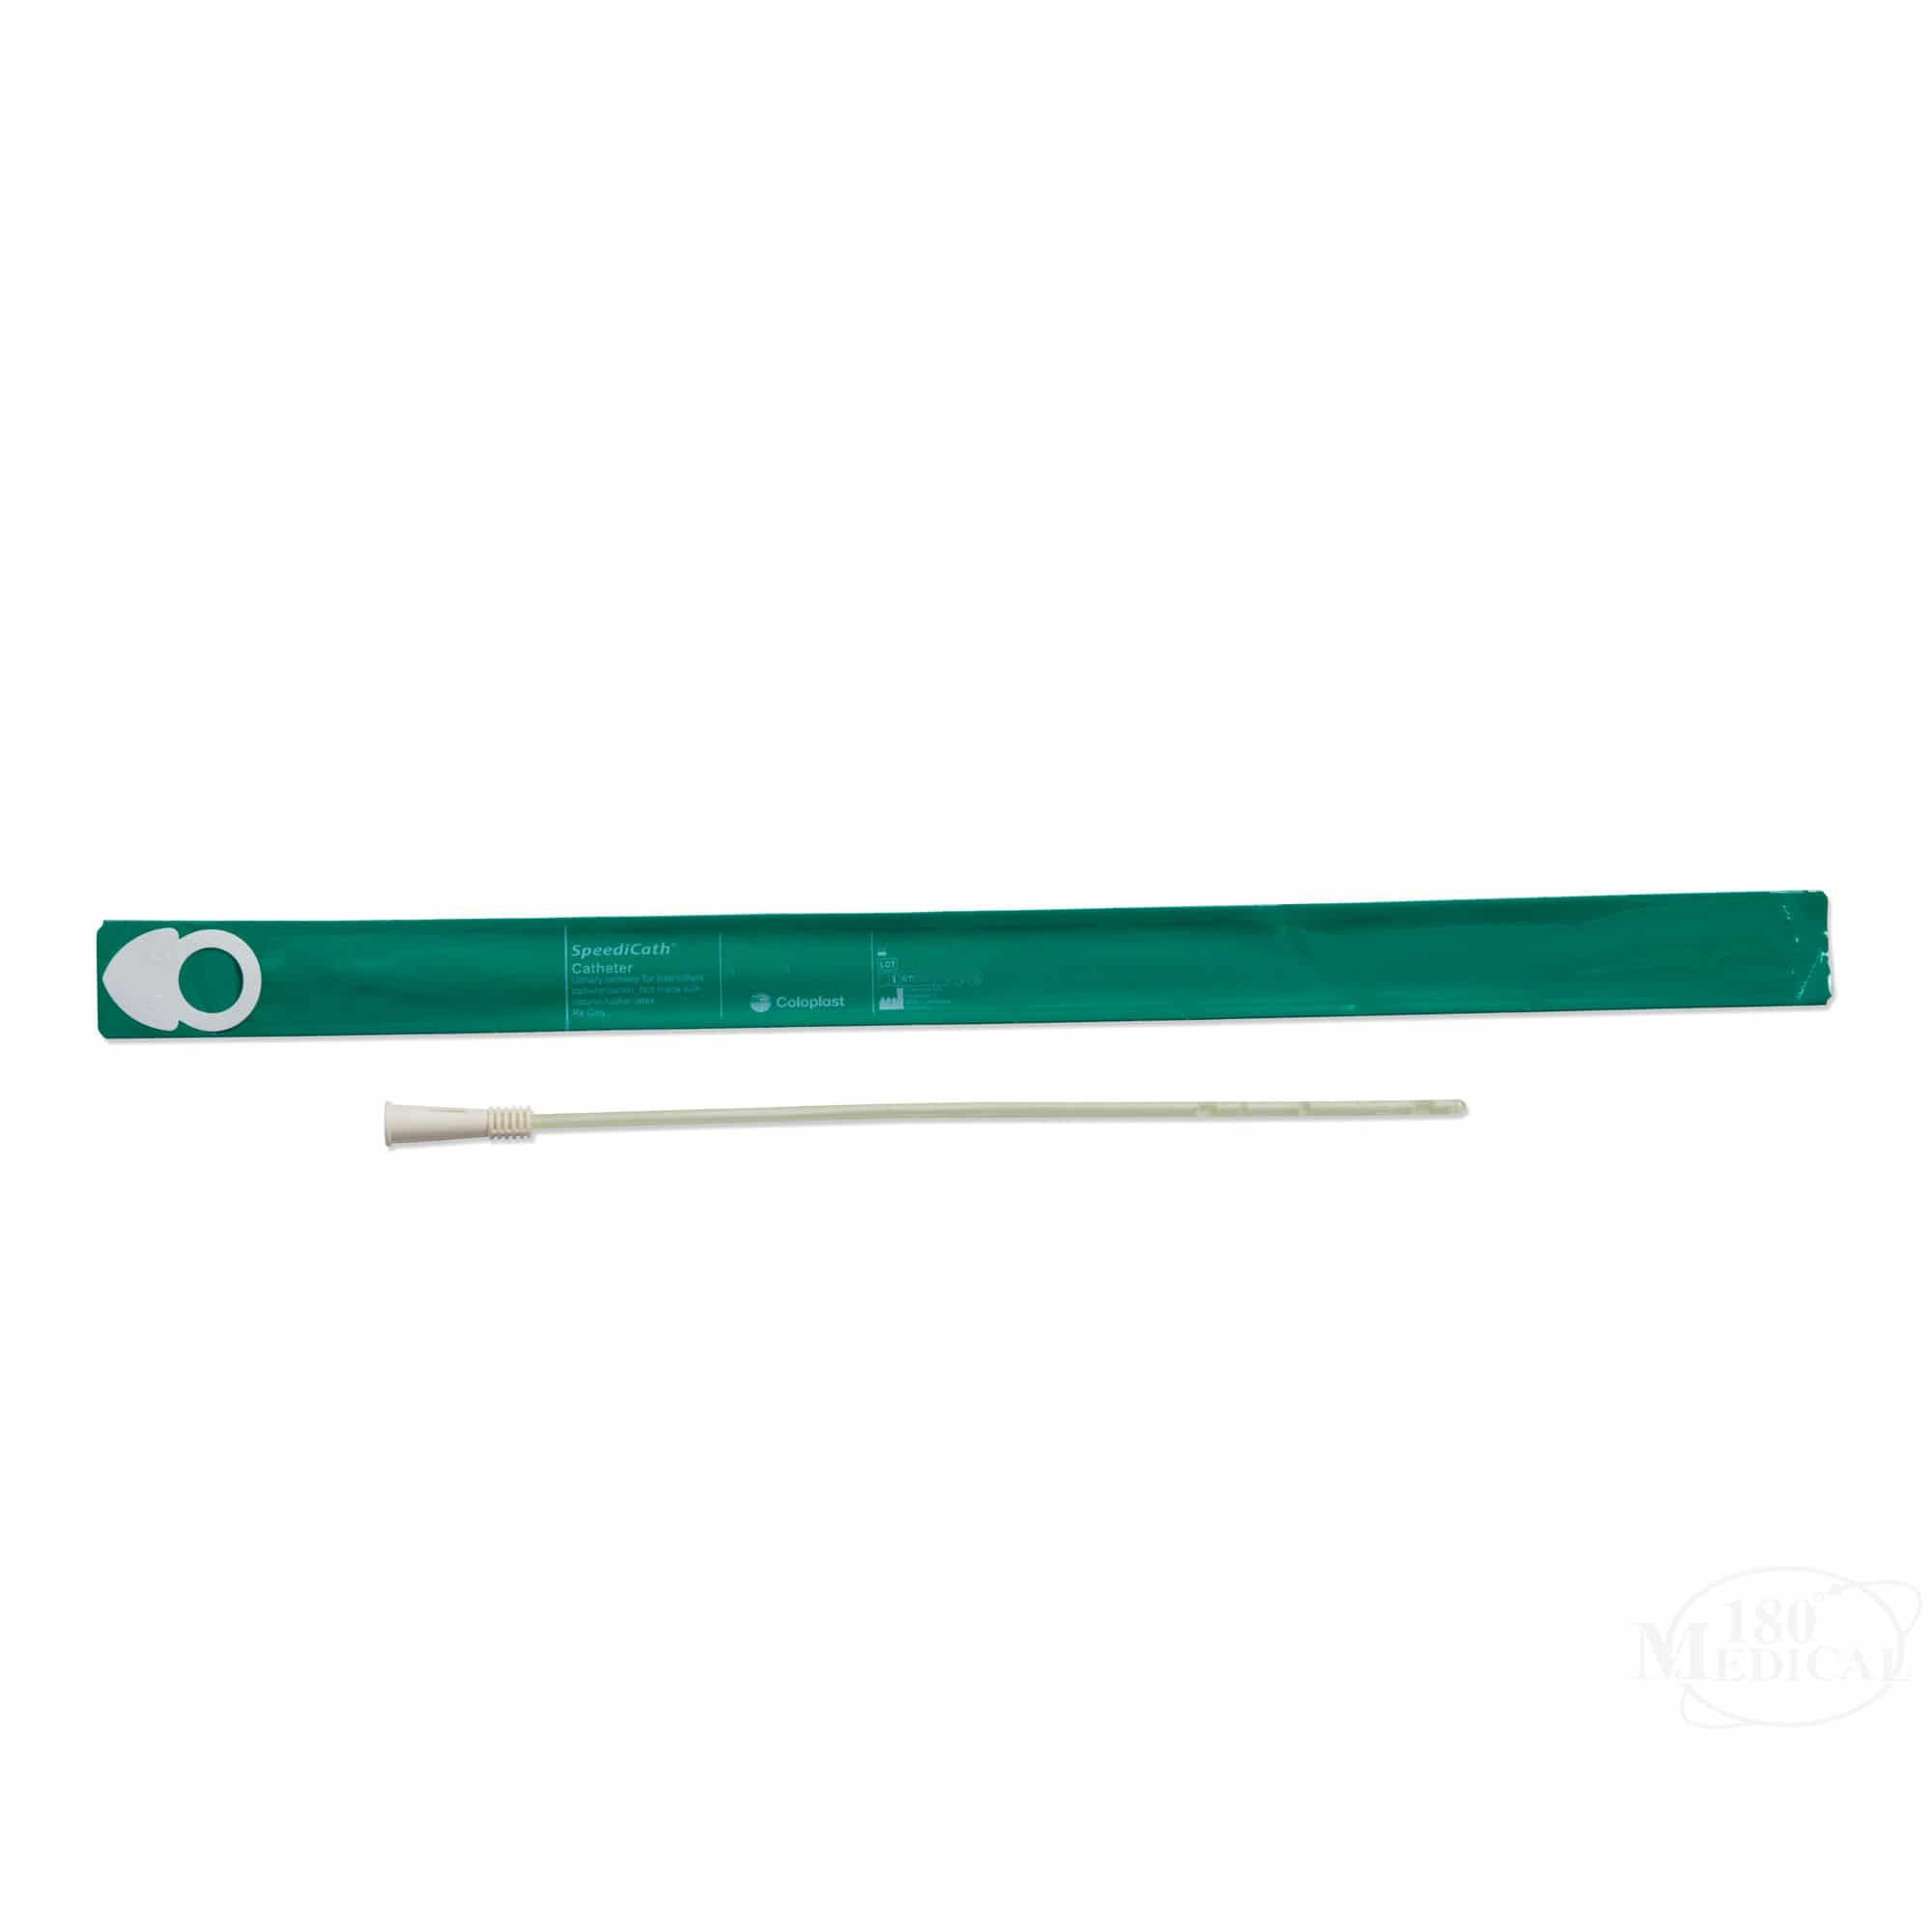 "SpeediCath Pediatric Intermittent Catheter, Straight, 8 Fr, 10"""